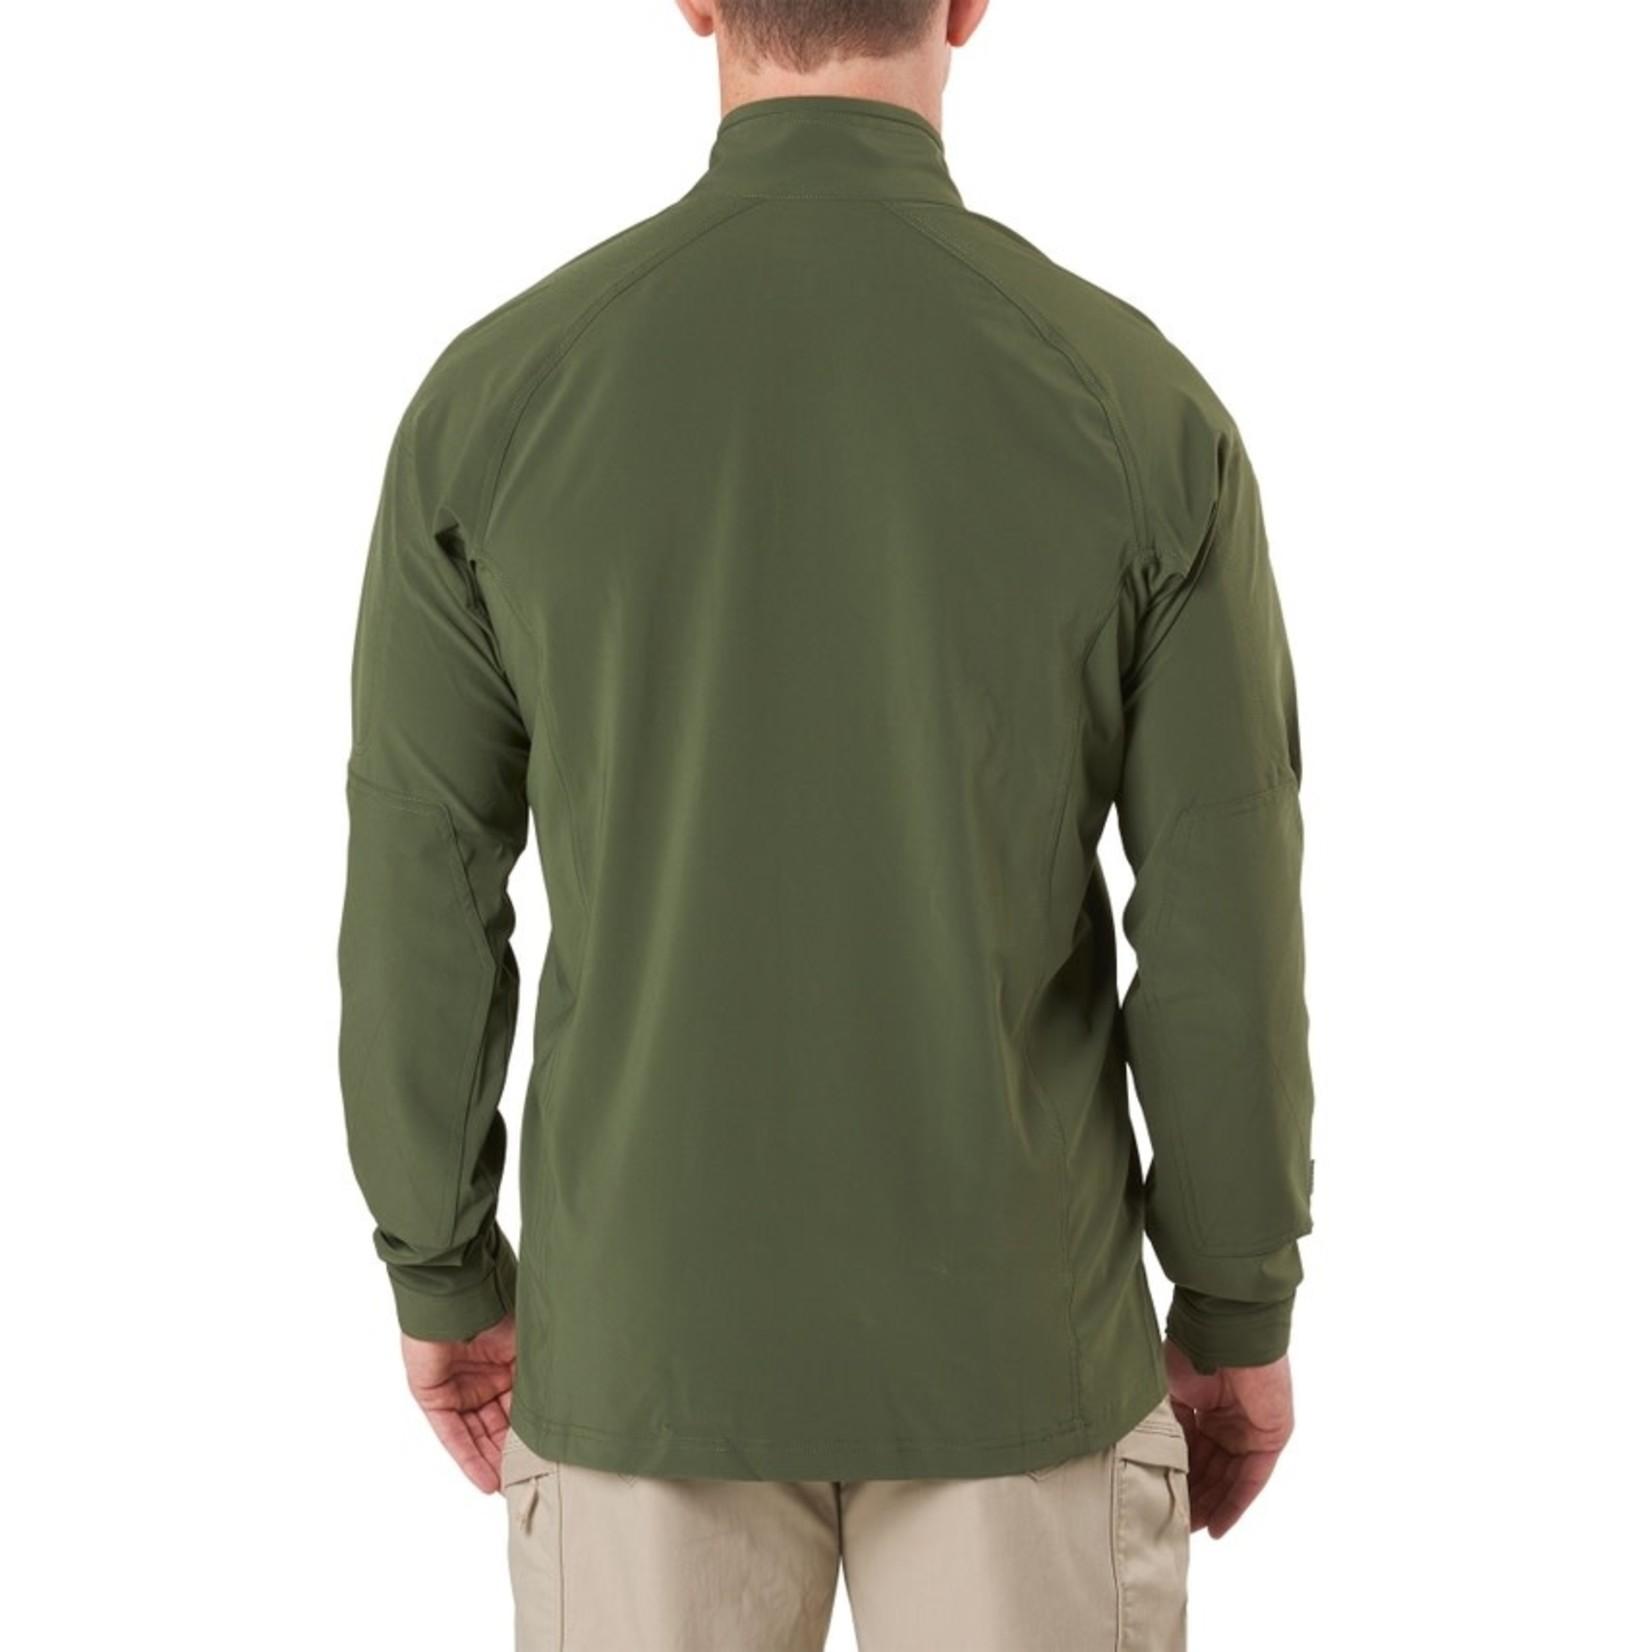 5.11 Tactical 5.11 Men's W/P Rapid Ops Shirt-Large